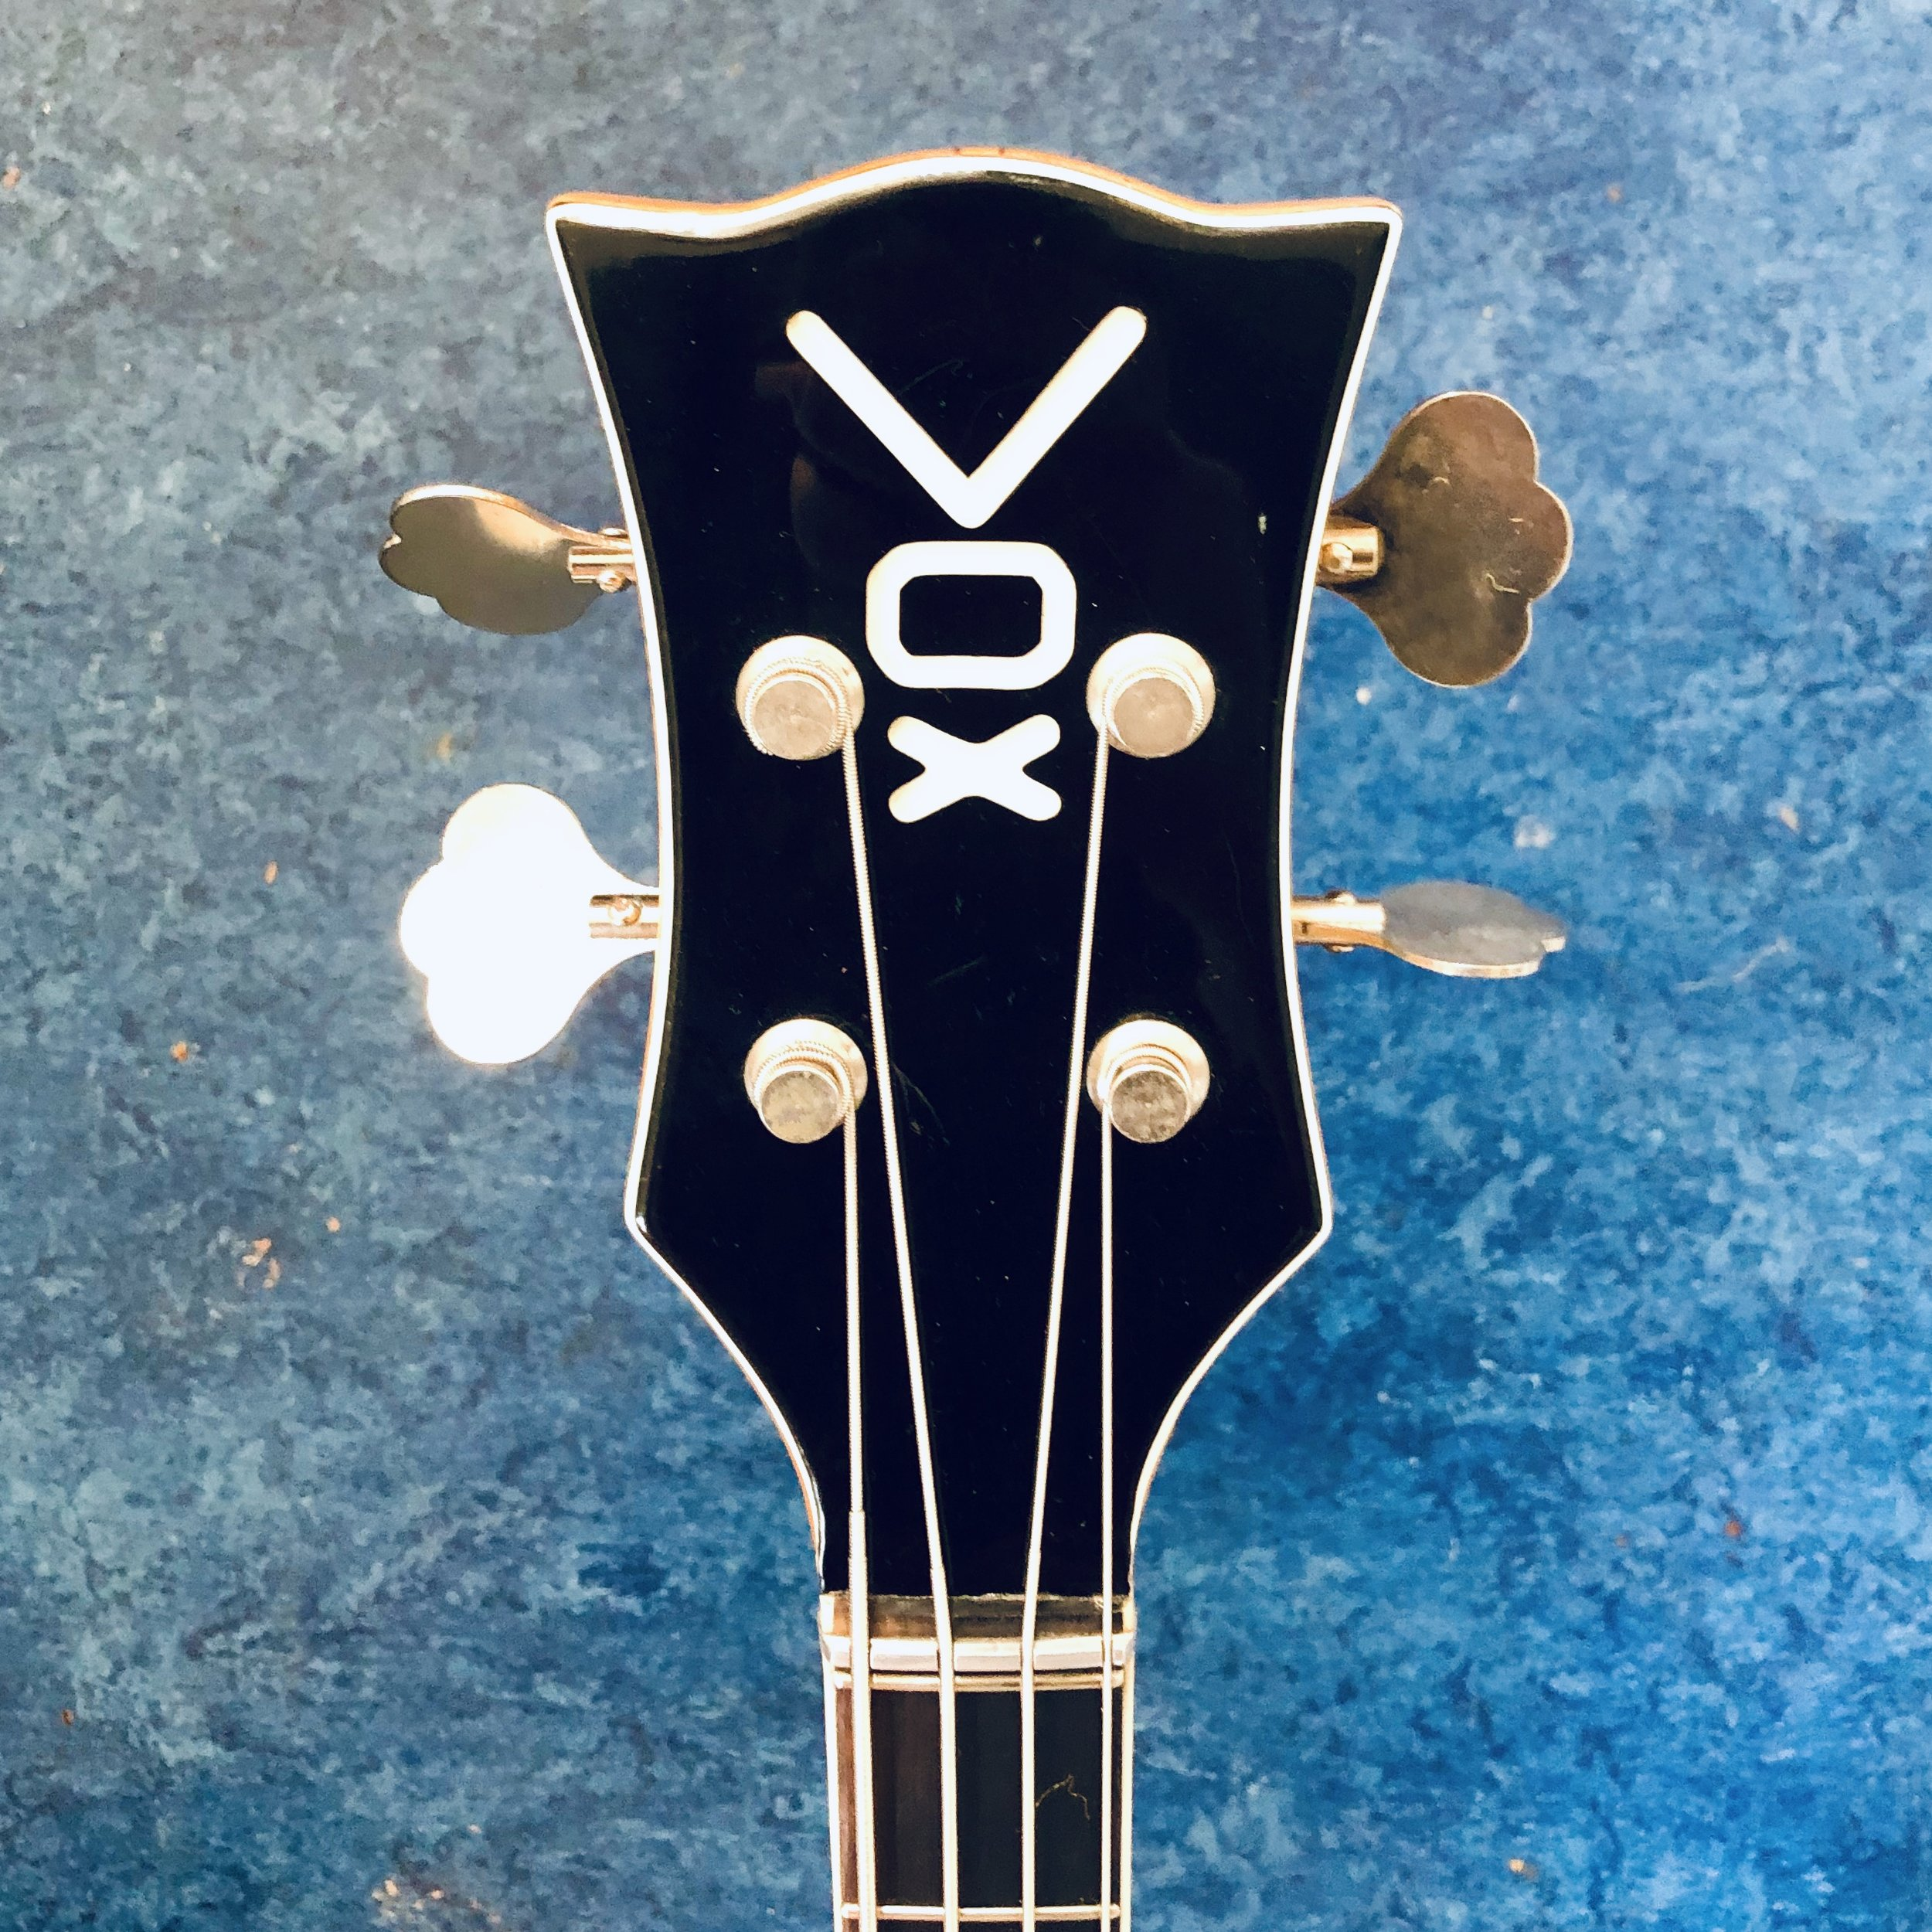 vox-cougar-bass-headstock.jpg